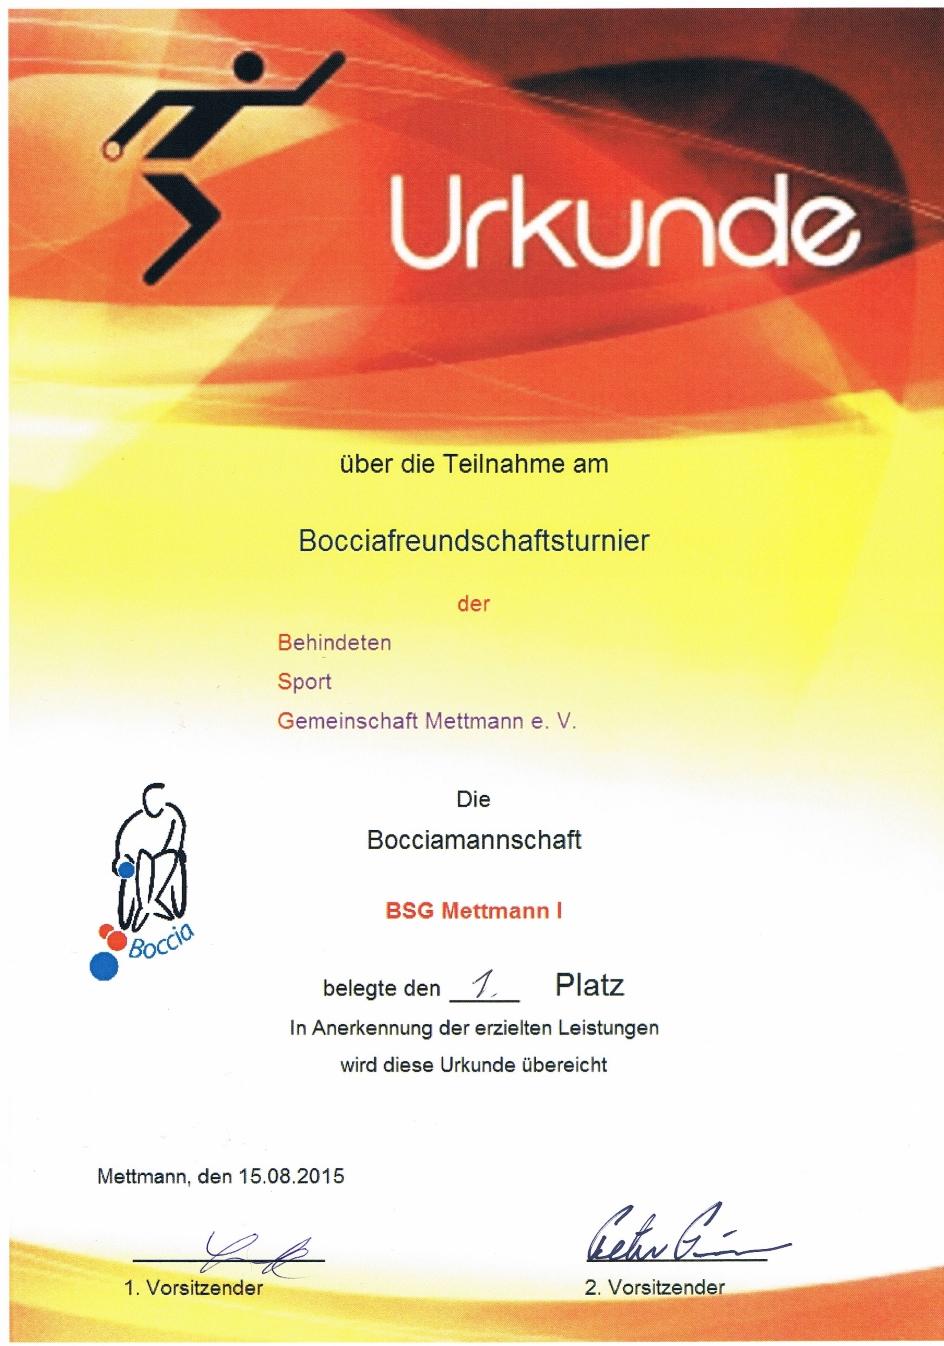 Bocciafreundschaftsturnier 2015